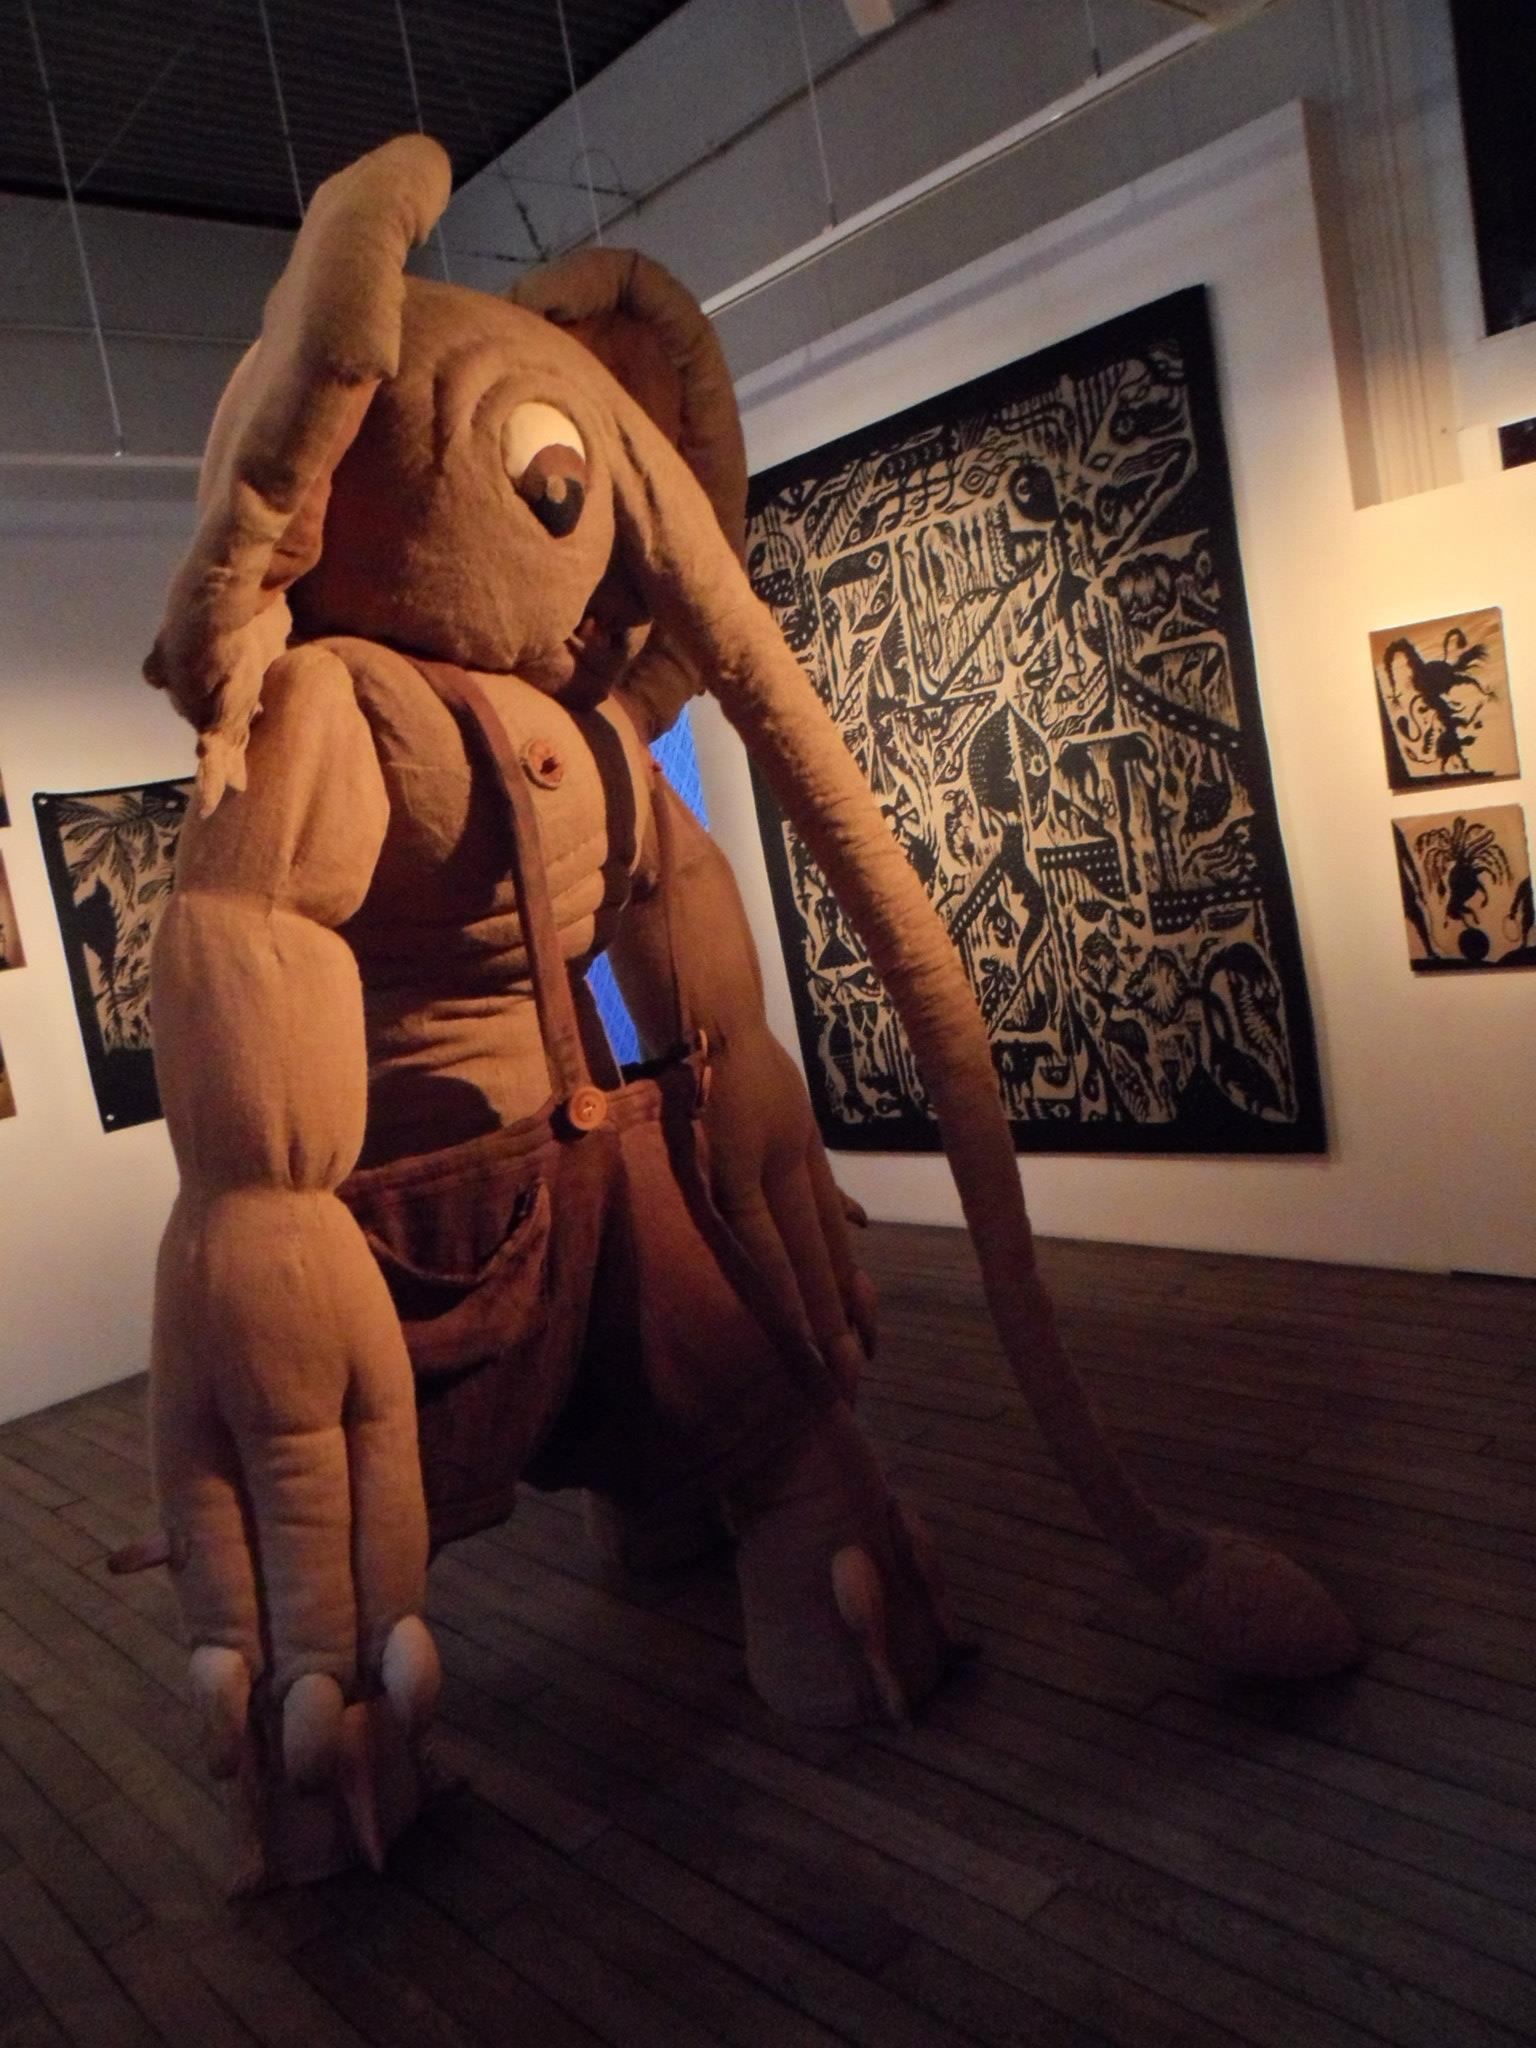 Stephane Blanquet - Evreux exhibition 4